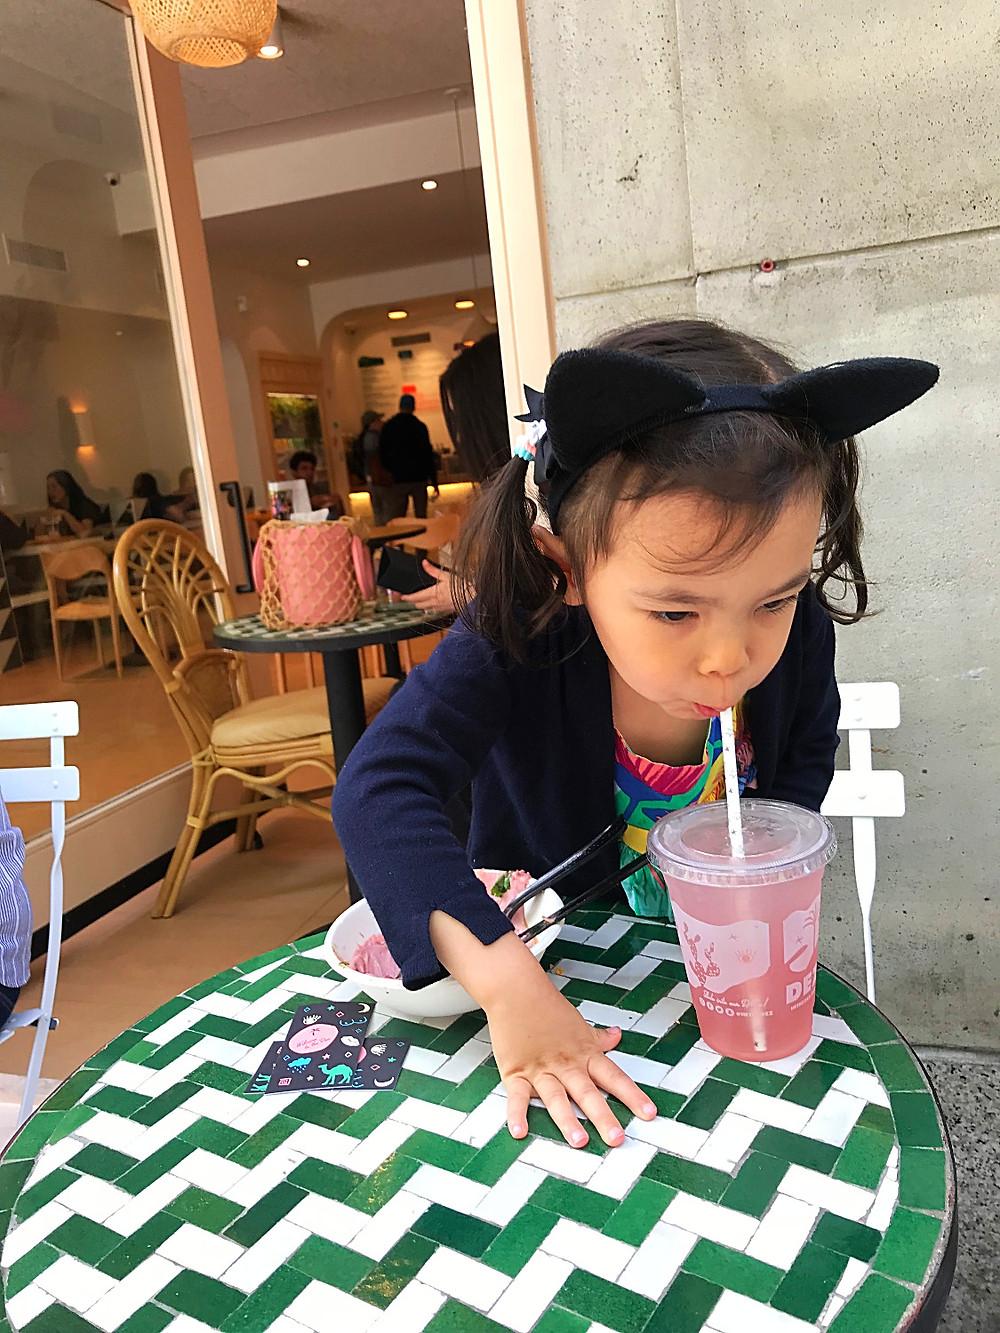 Dez, Nolita, kid friendy restaurant, NYC kids, Curious G and Me